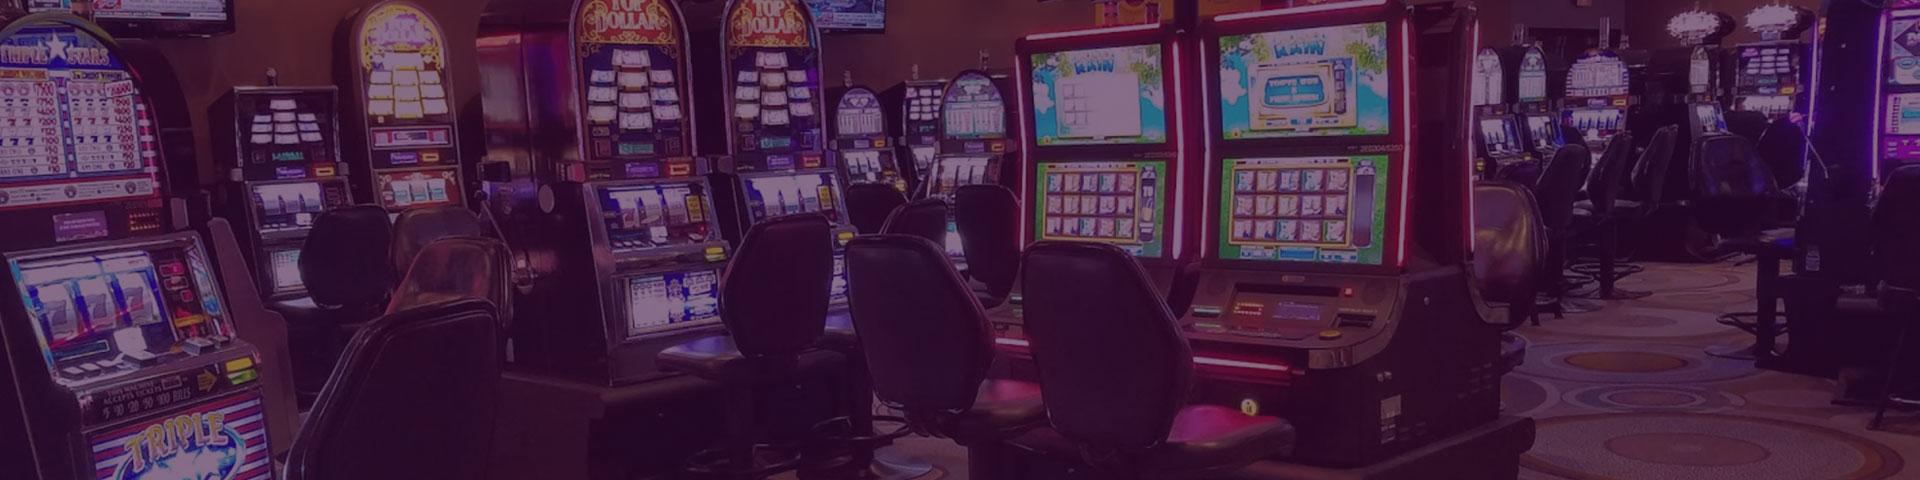 slots video poker